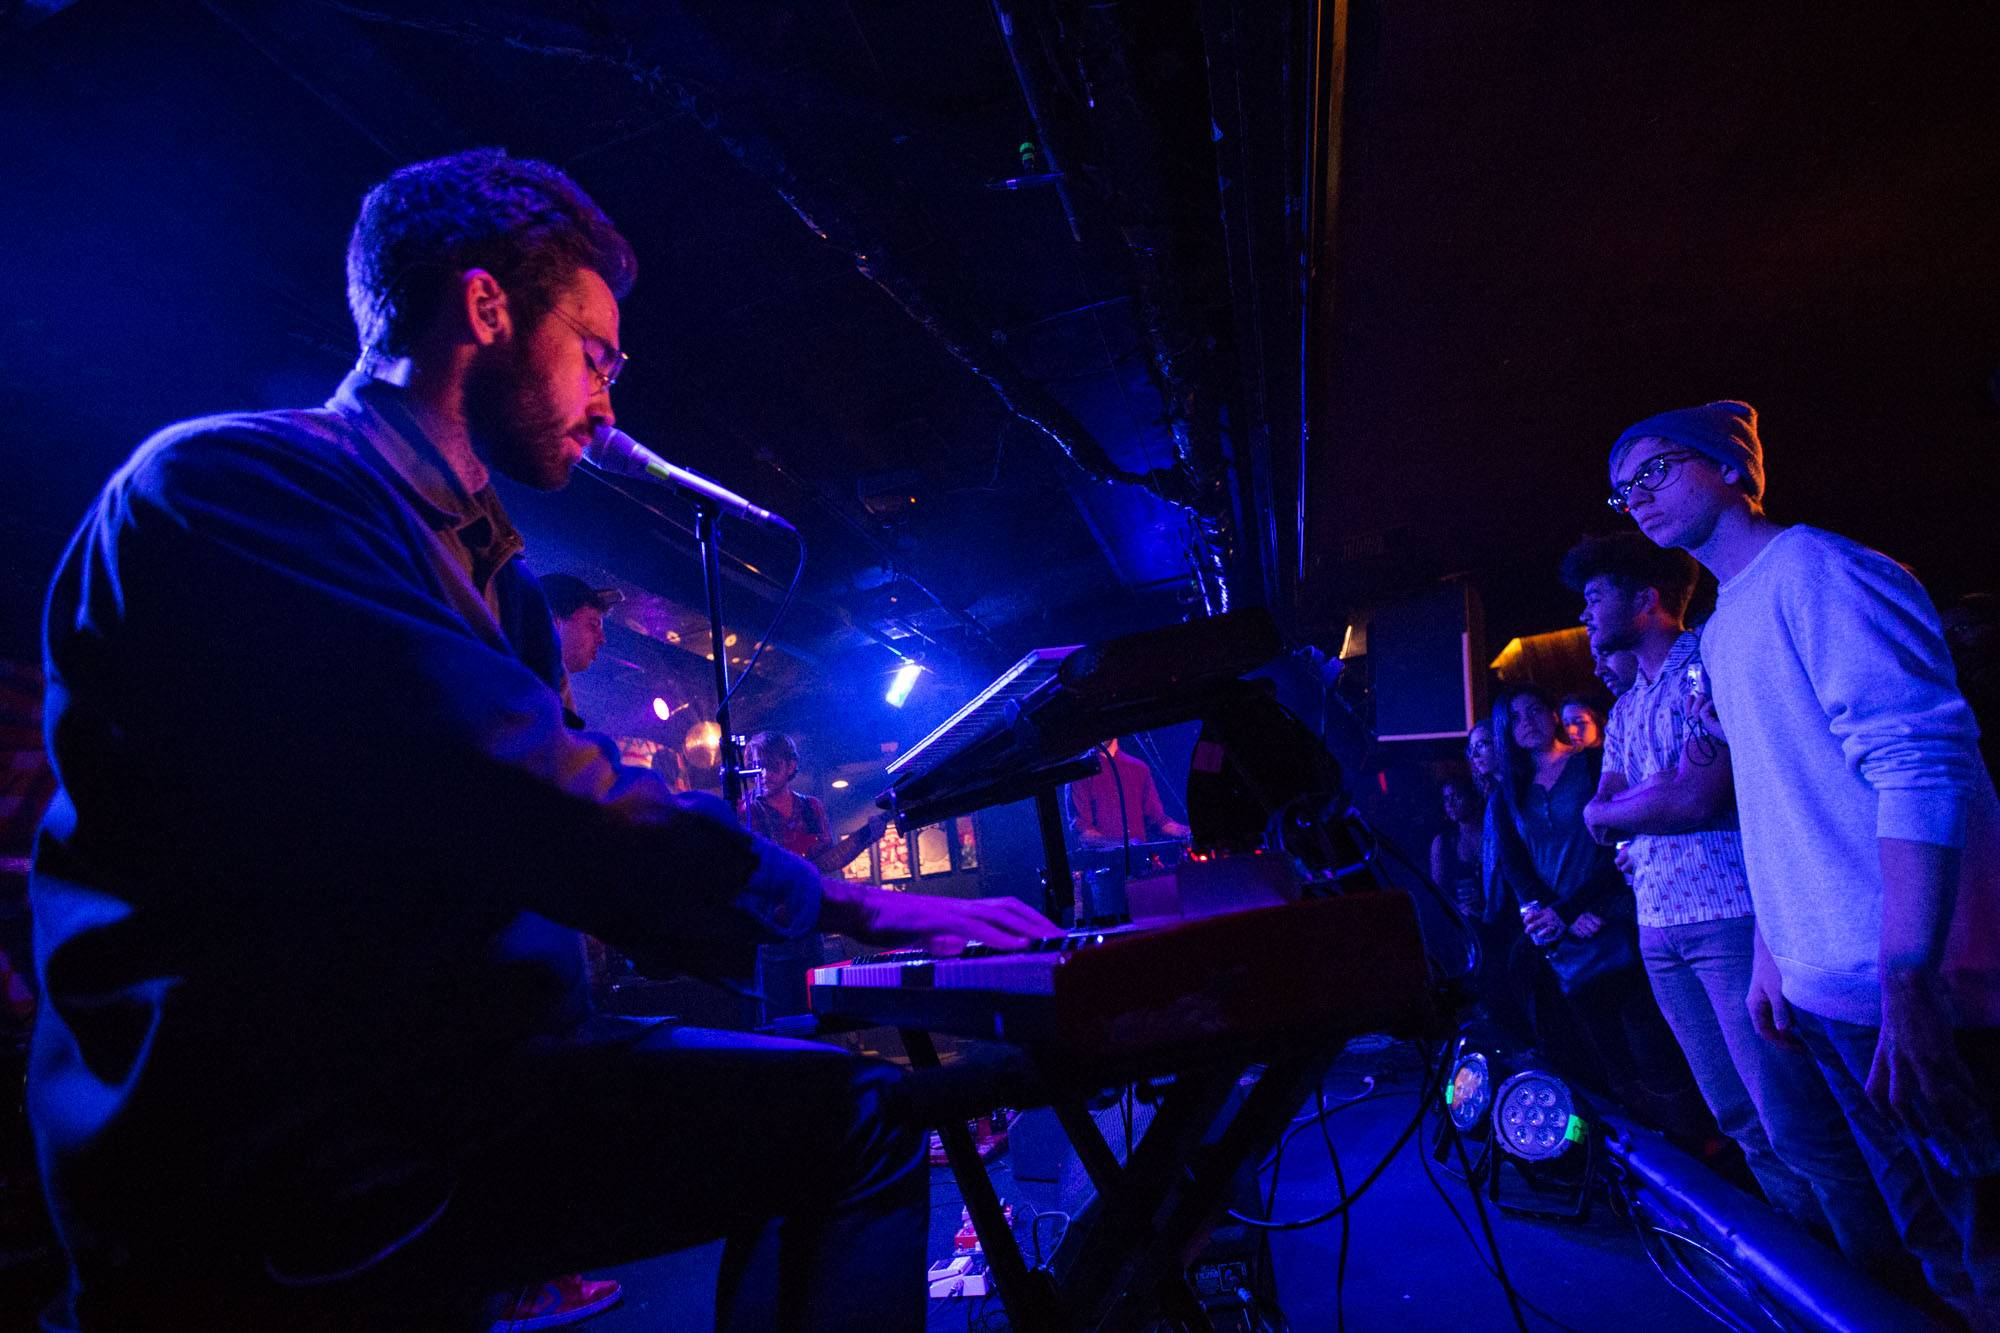 Astronauts Etc at the Biltmore Cabaret, Vancouver, Sept 21 2015. Kirk Chantraine photo.